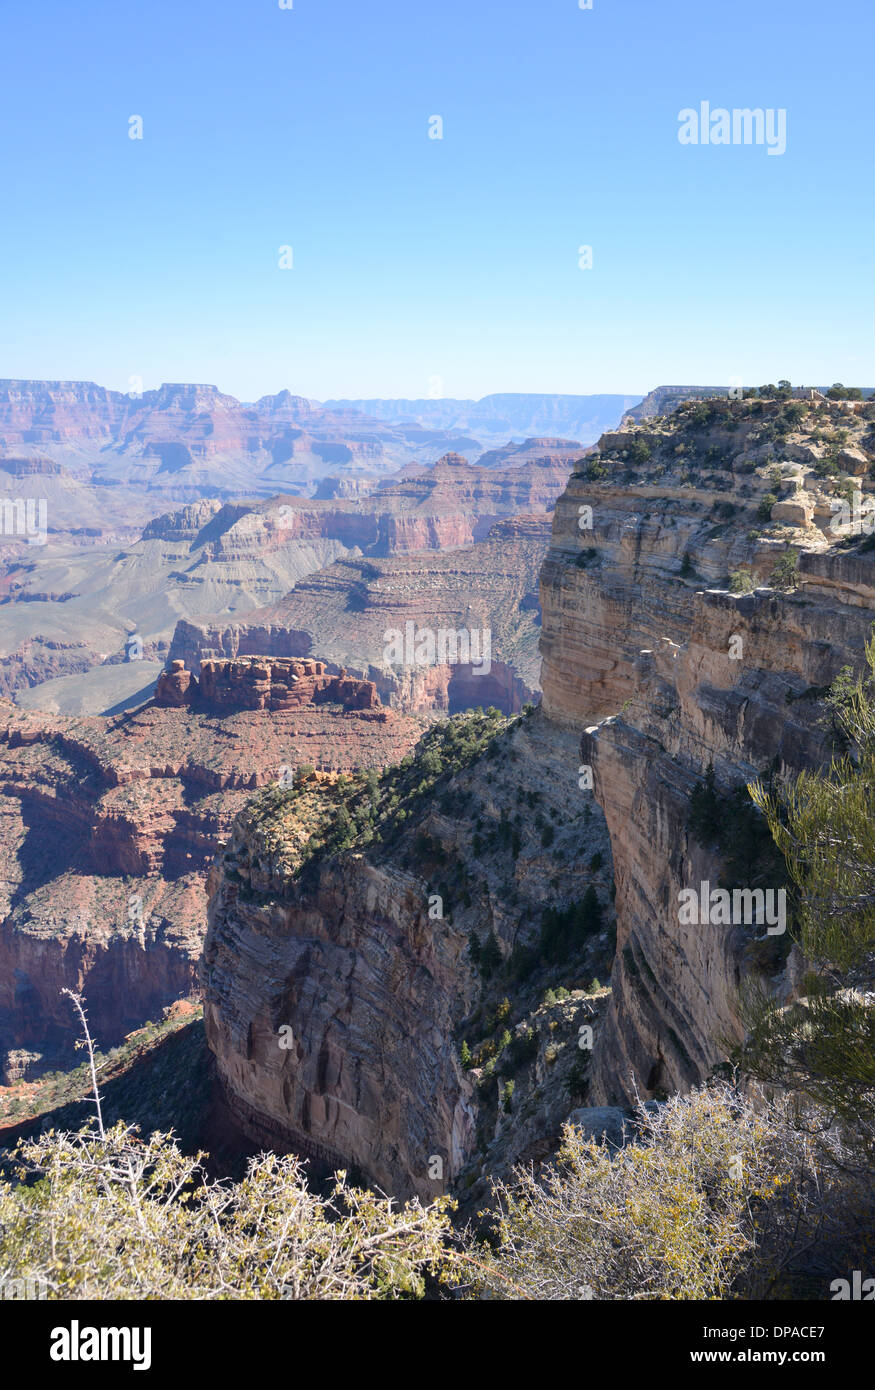 The Grand Canyon, Arizona, USA. Vast and impressive natural wonder - Stock Image